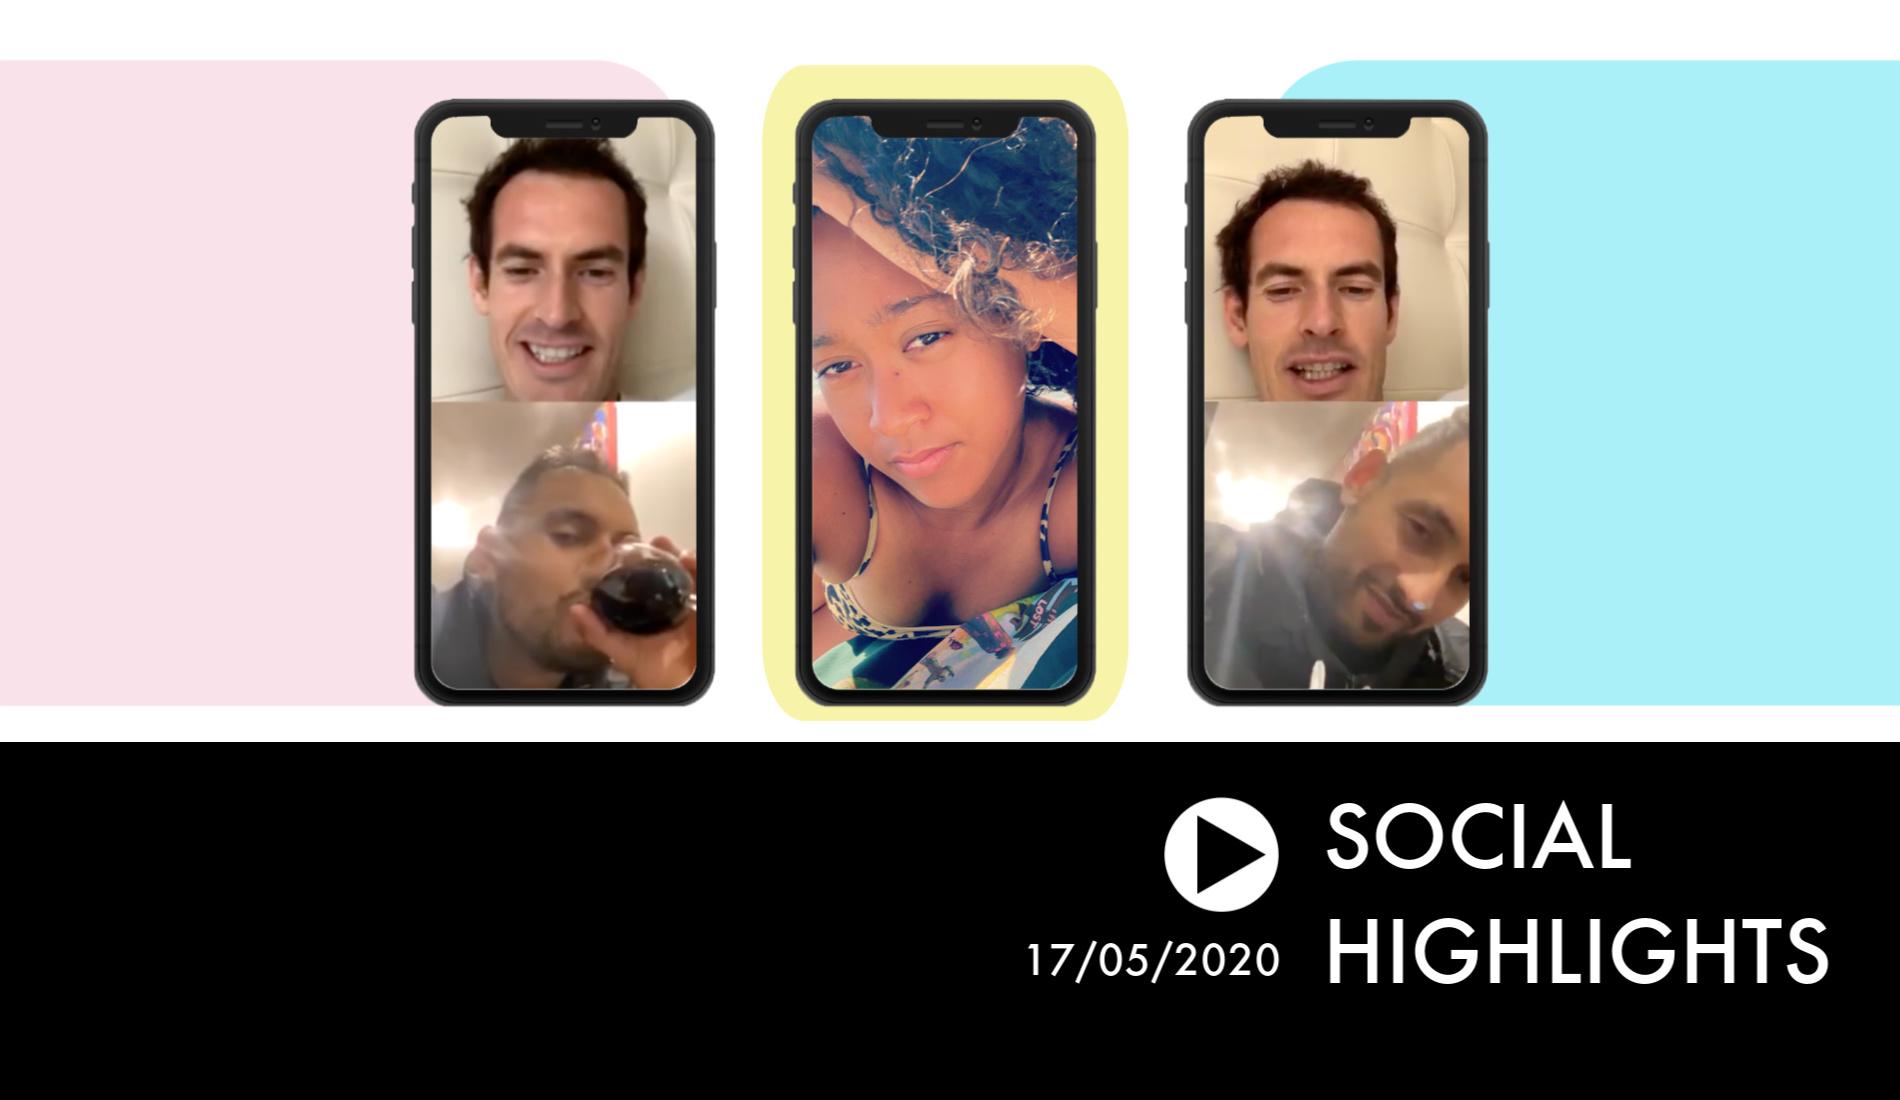 Social Highlights #8 - Nick Kyrgios's show